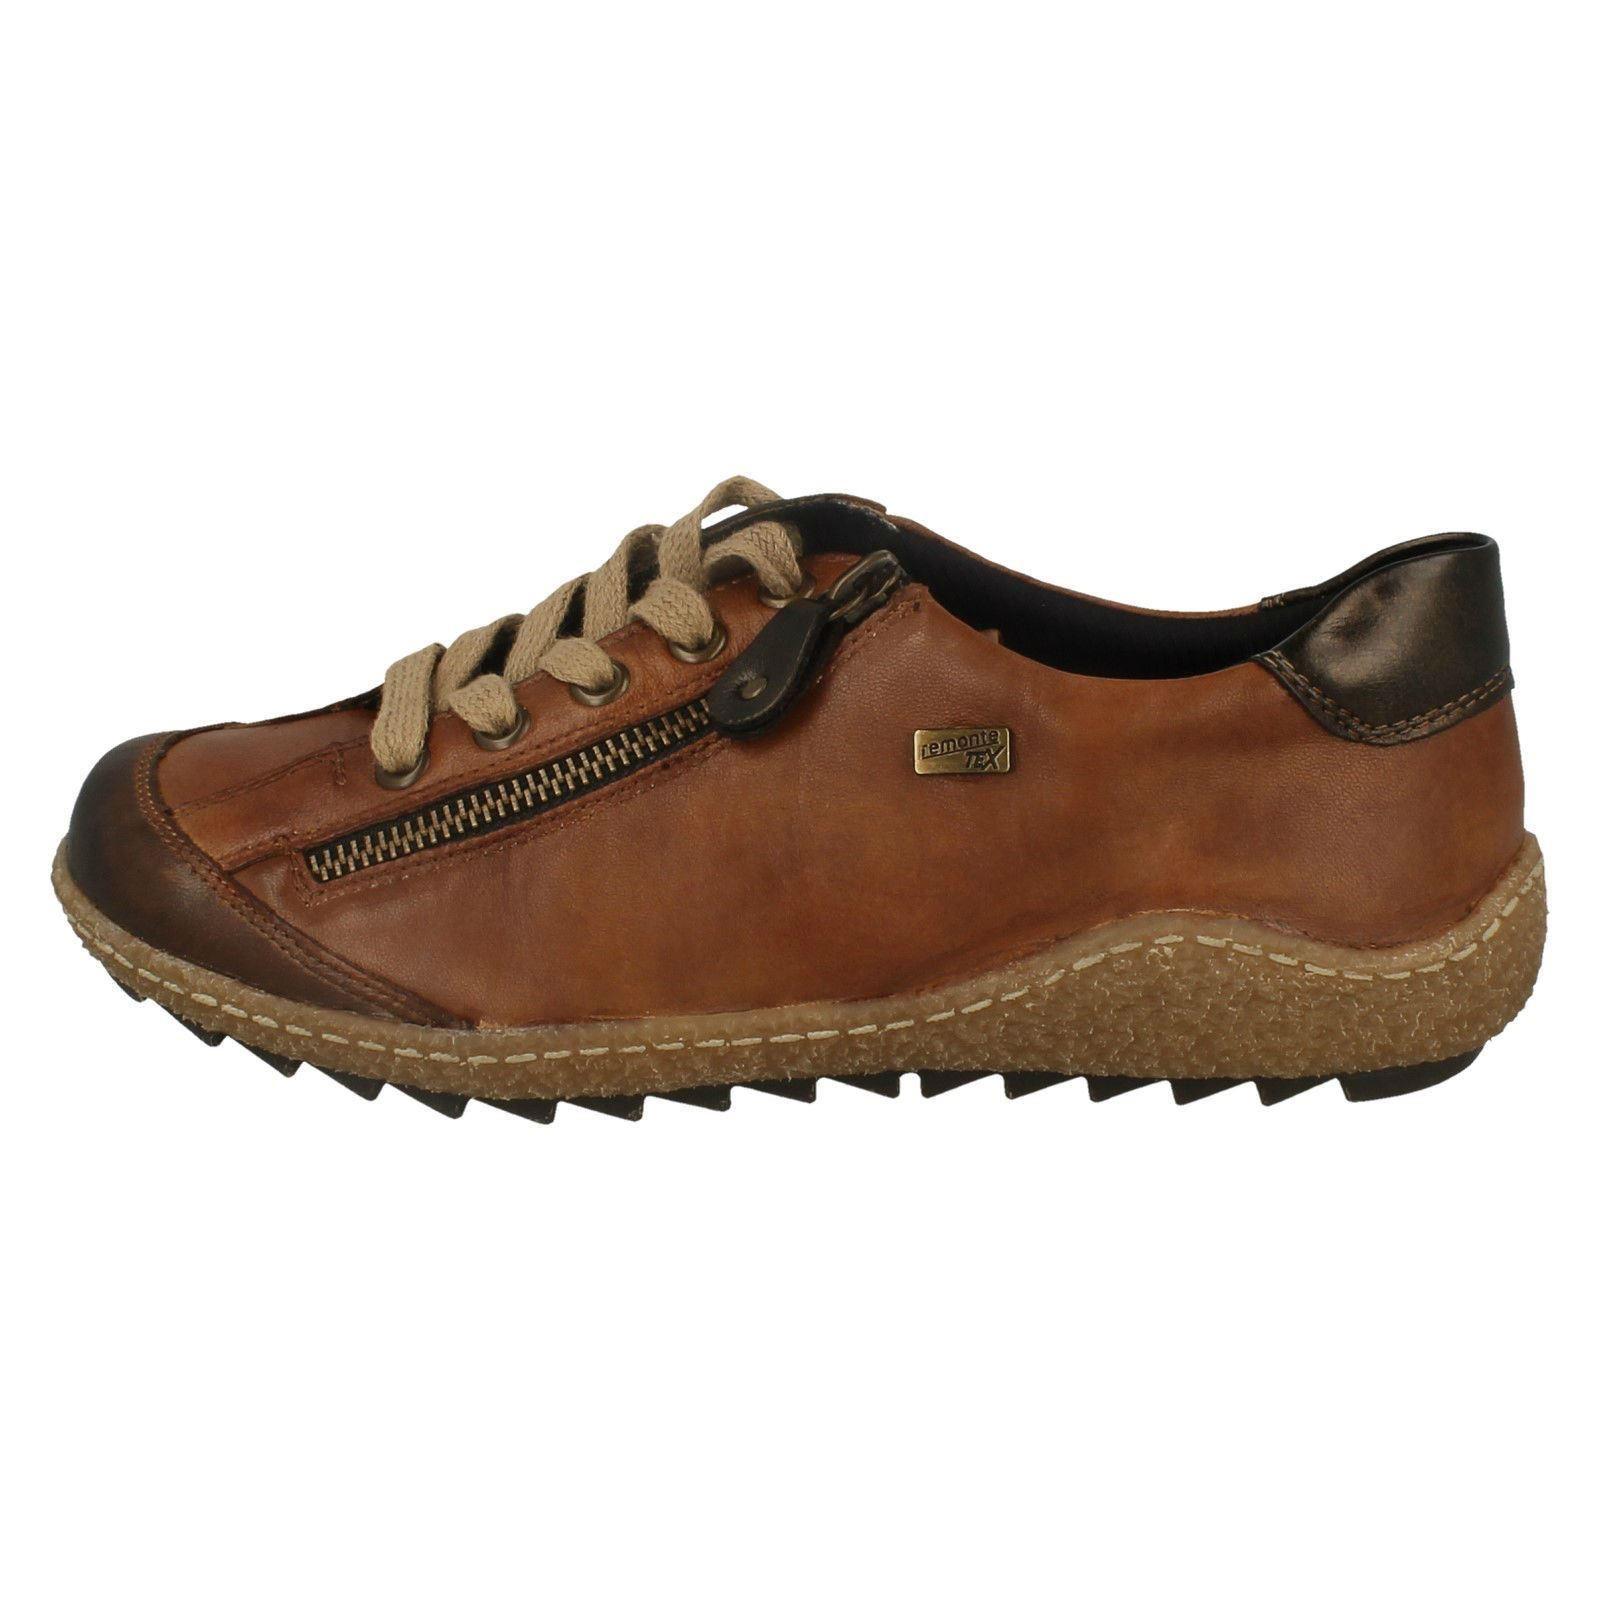 Chaussures Chaussures Chaussures Chaussures Chaussures Chaussures Chaussures Chaussures ZTwdB75qw